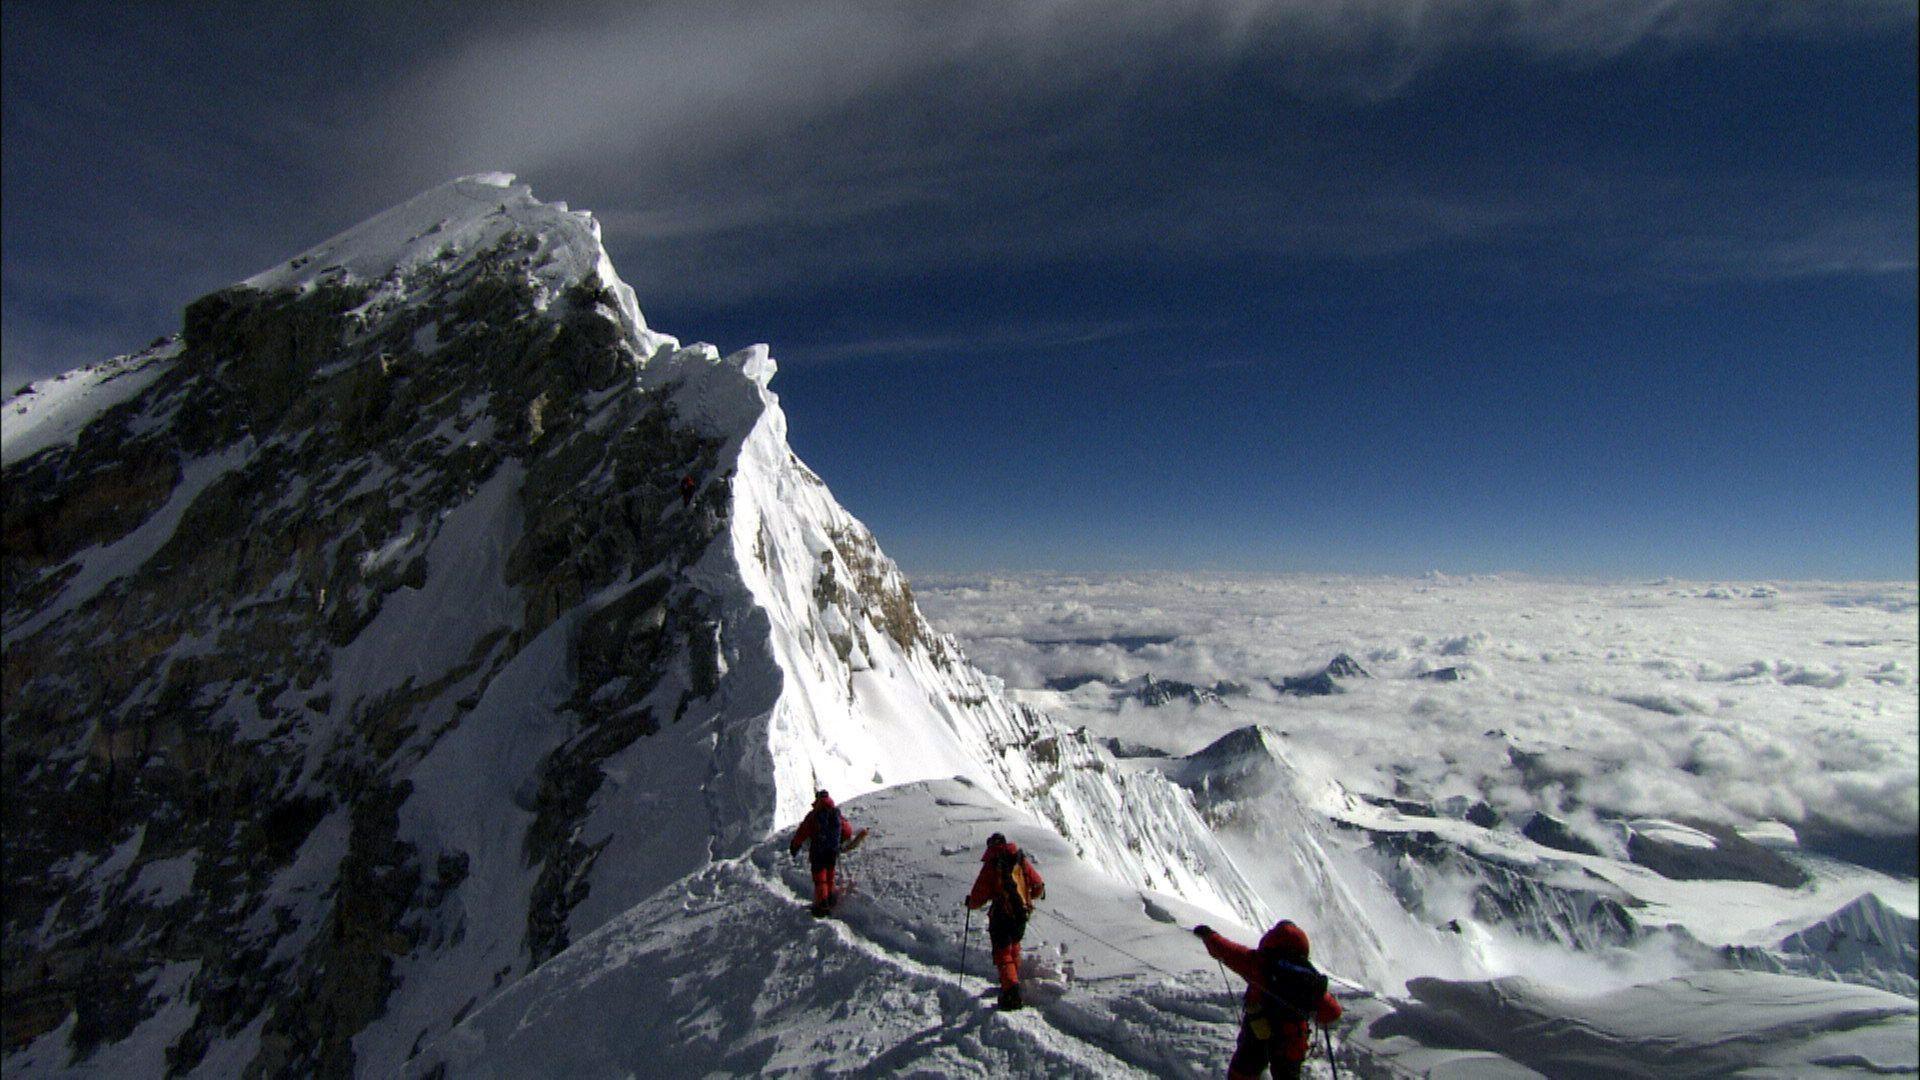 Mount Everest big summit point HD Wallpaper – HD Landscape Wallpaper